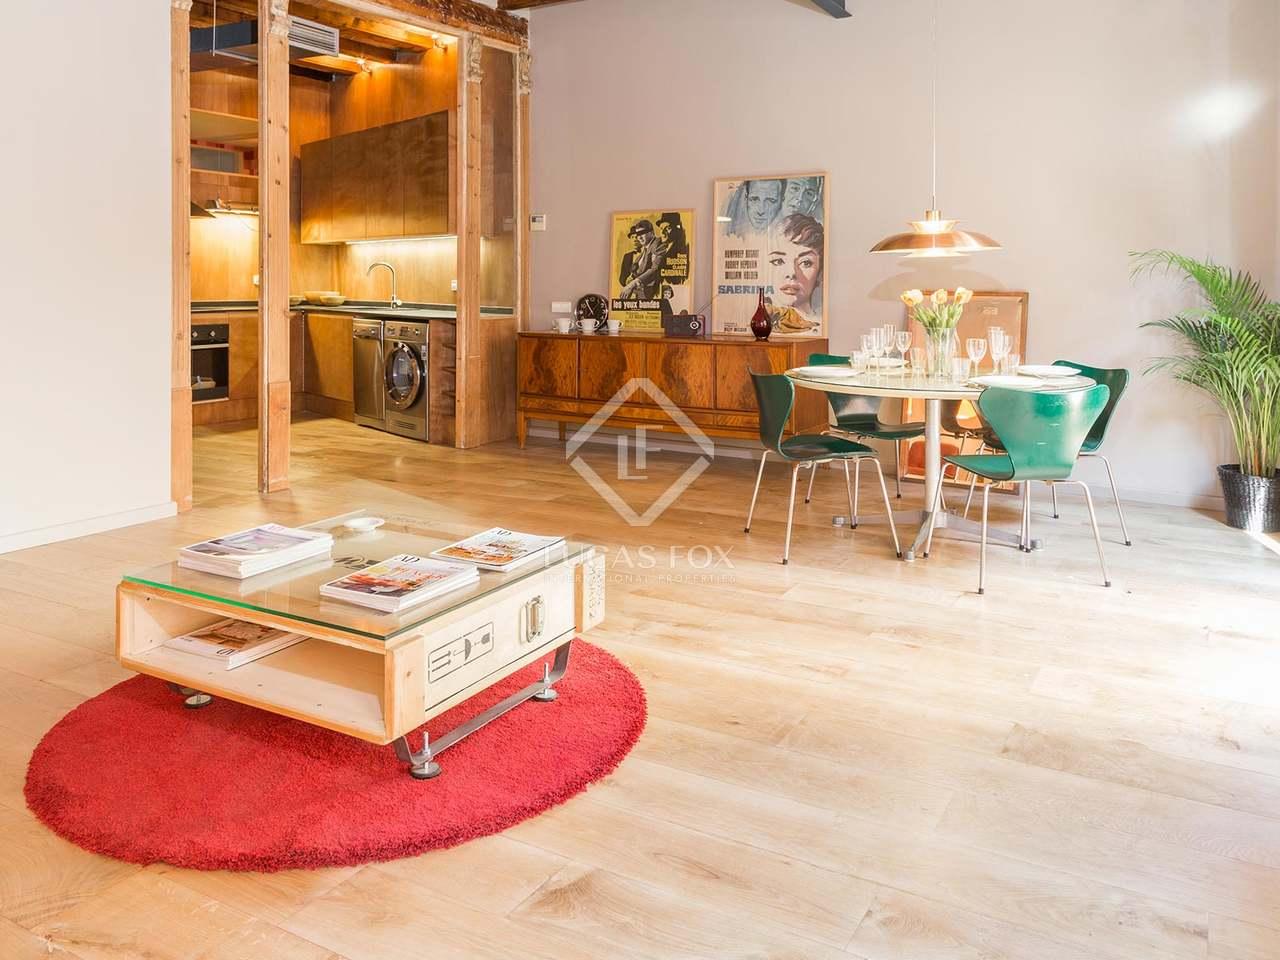 Appartement de 79m a vendre g tico barcelone for Appartement avec piscine barcelone